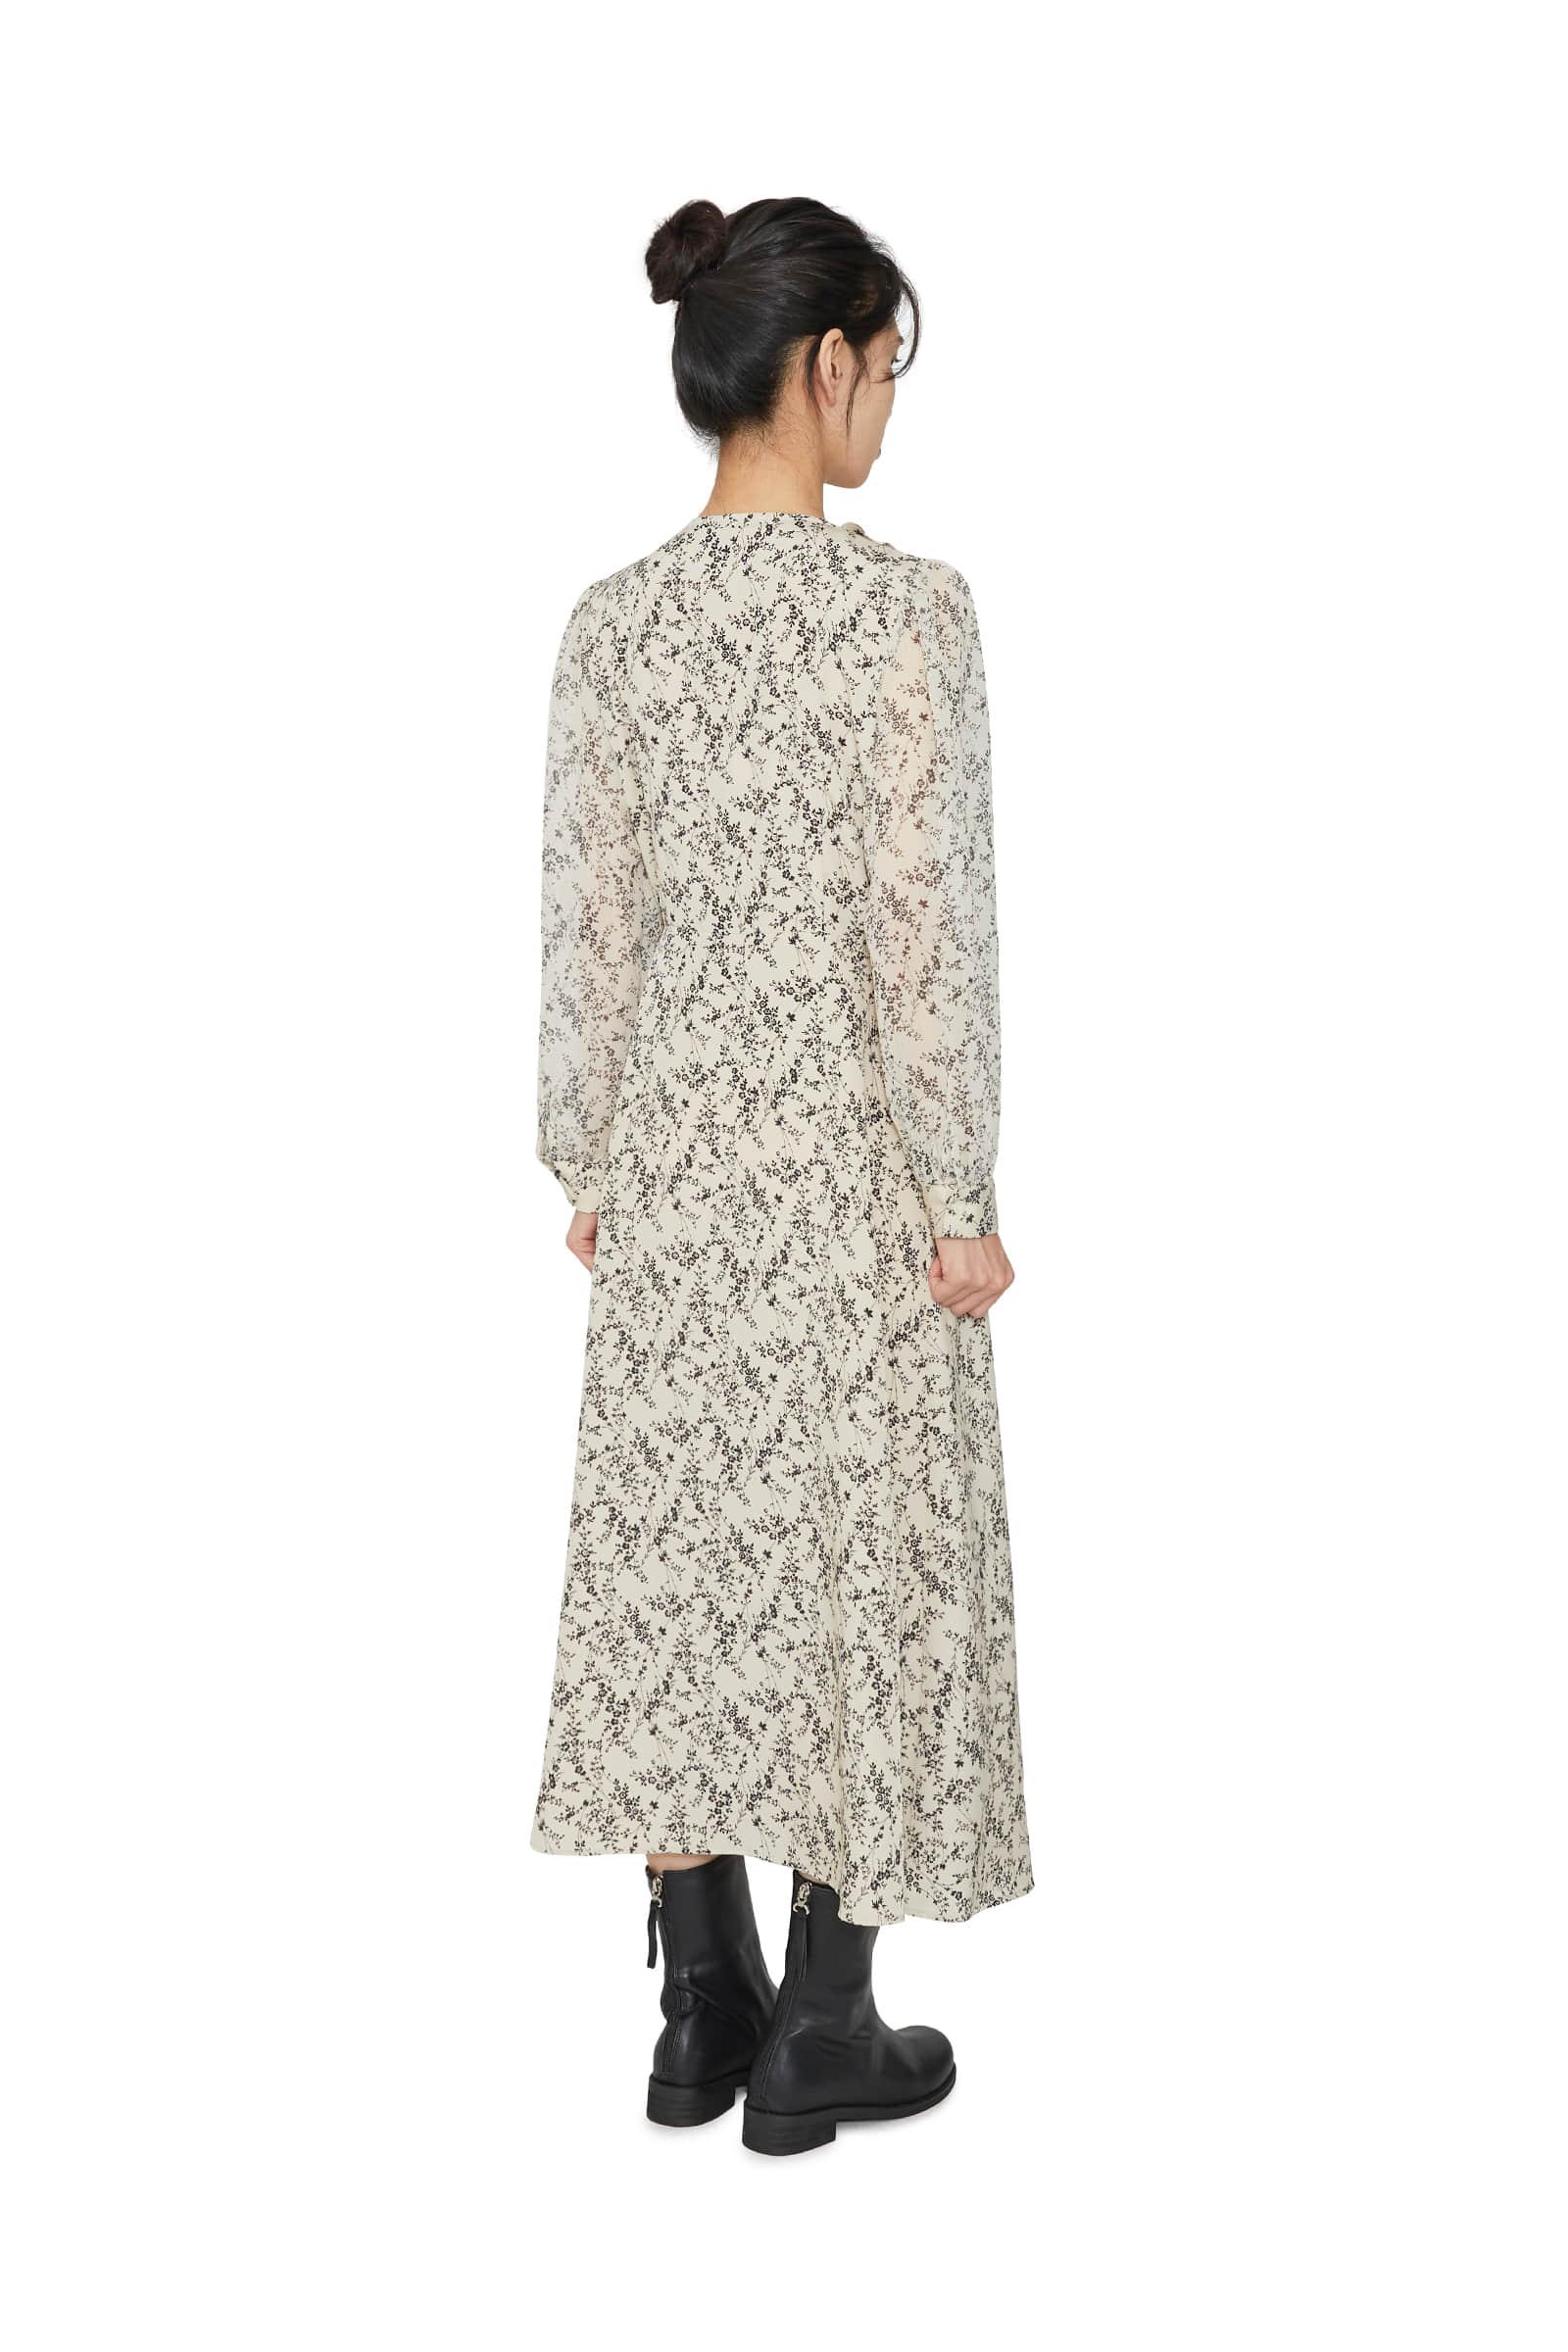 Common floral maxi dress